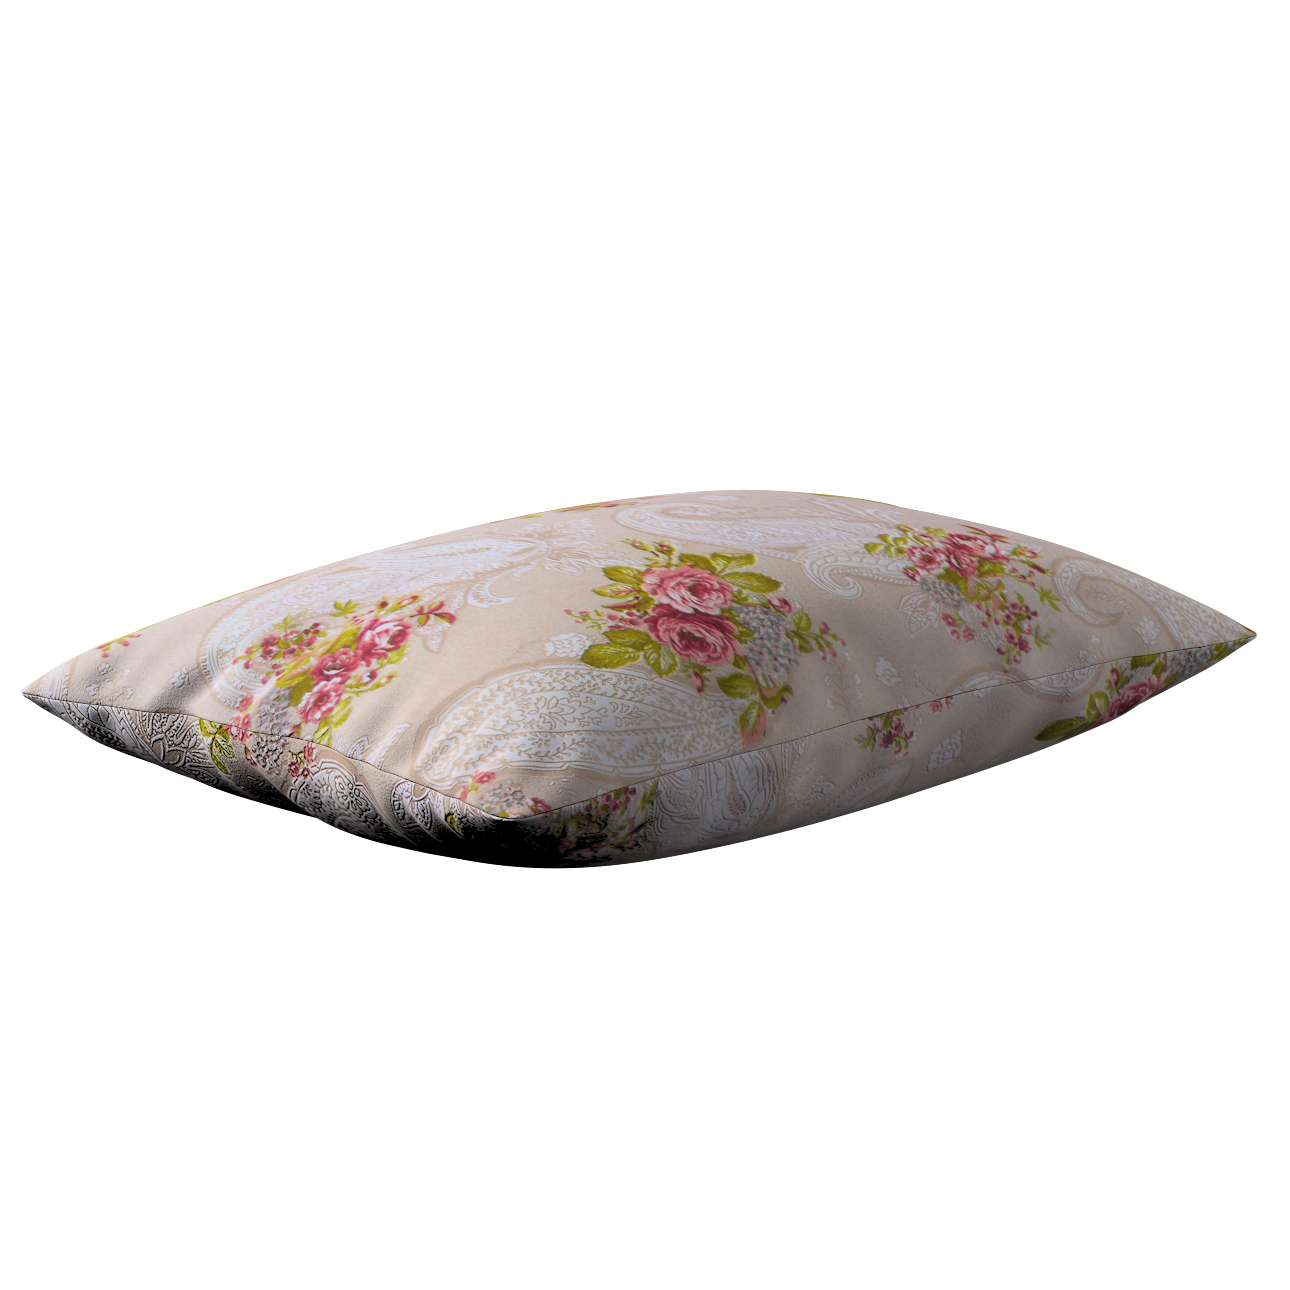 Kinga - potah na polštář jednoduchý obdélníkový v kolekci Flowers, látka: 311-15